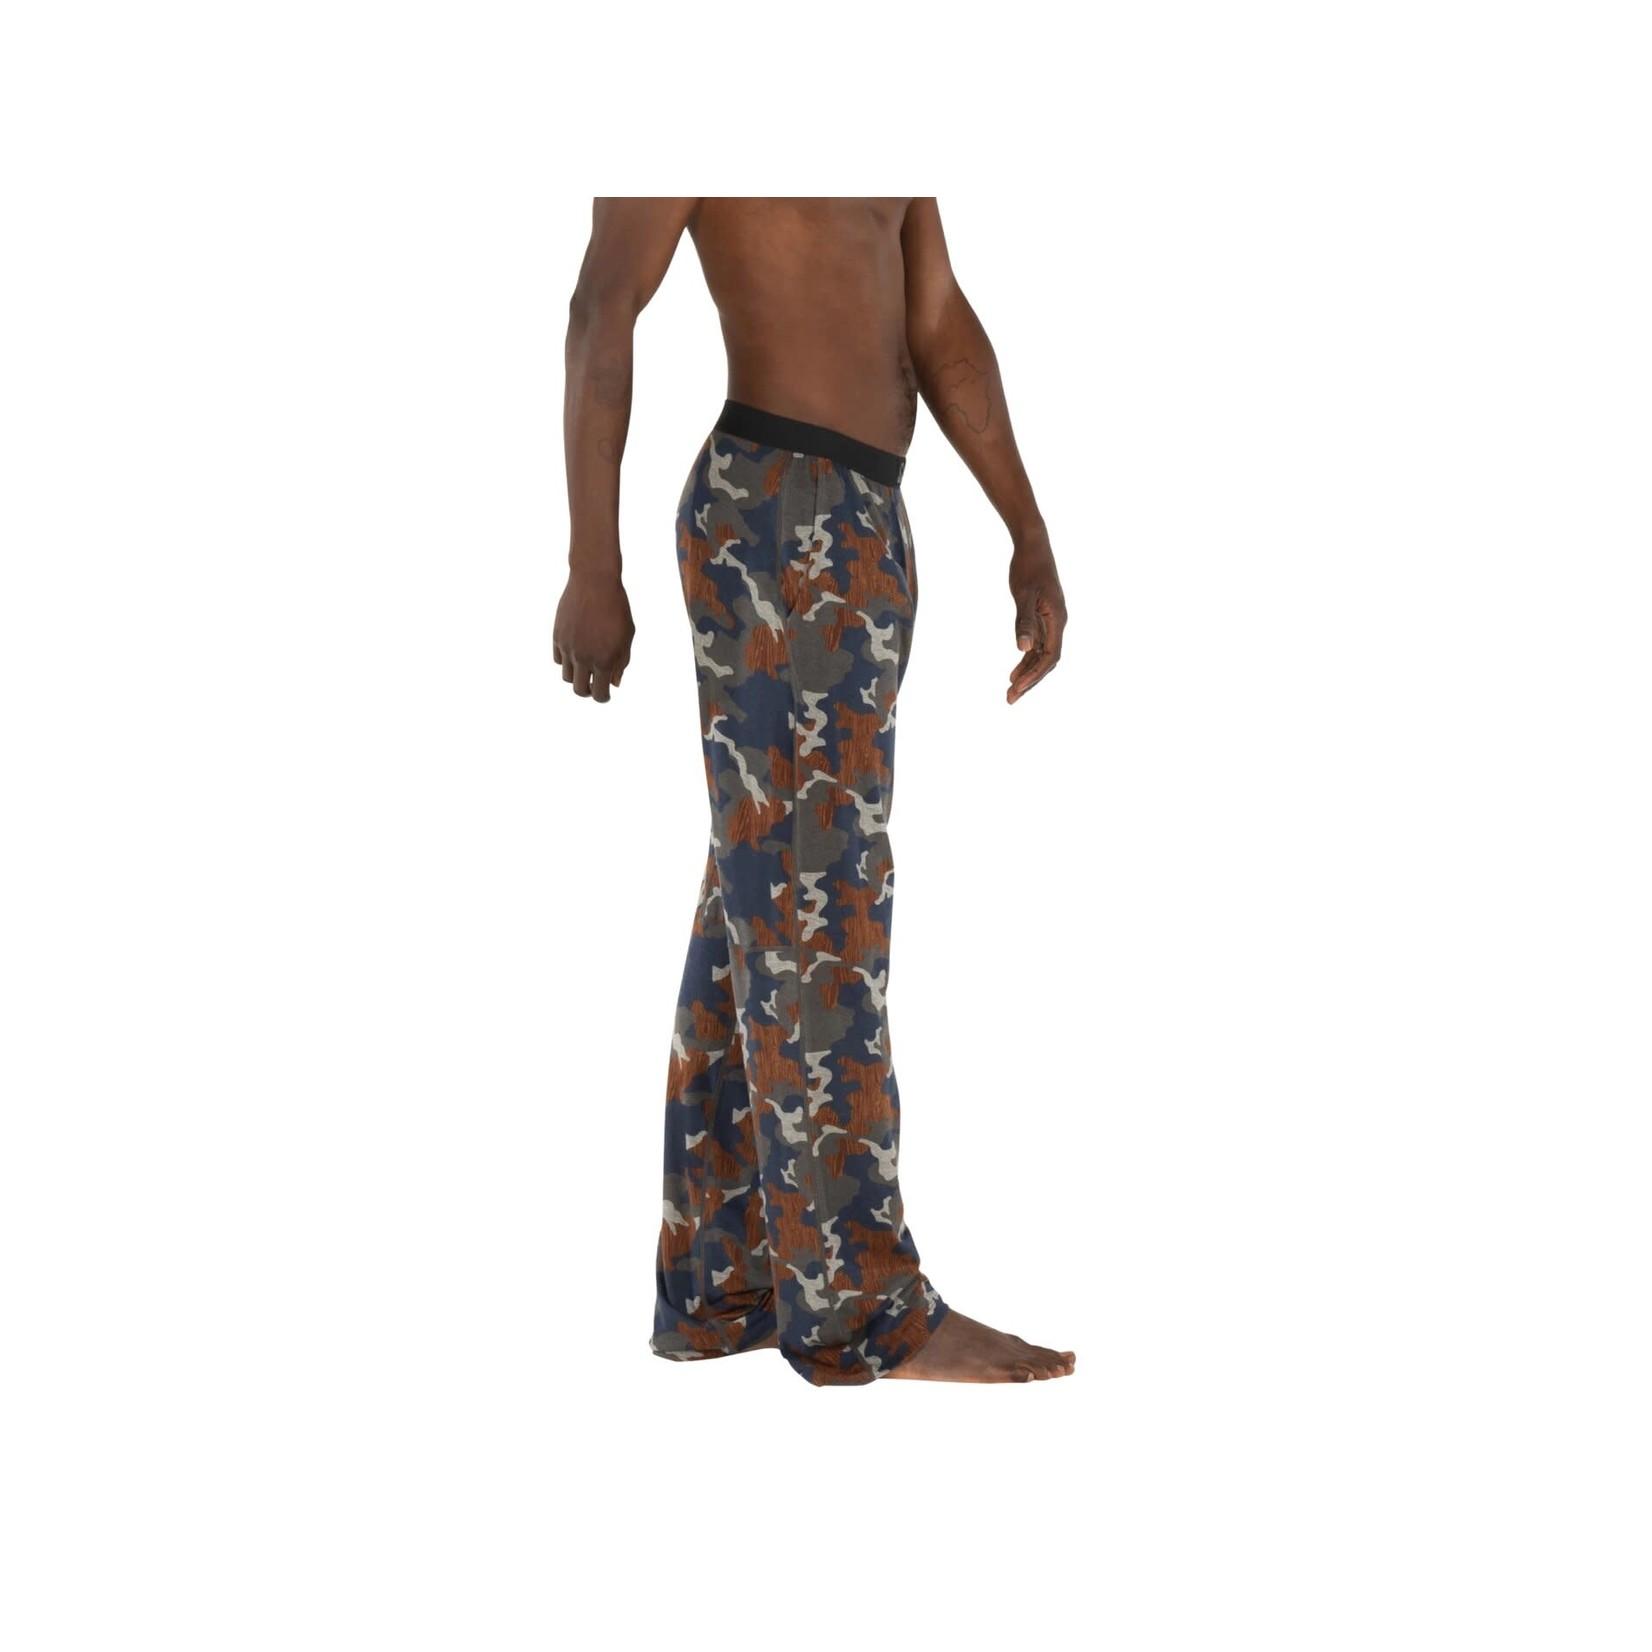 Saxx Snooze Pants Wood Grain